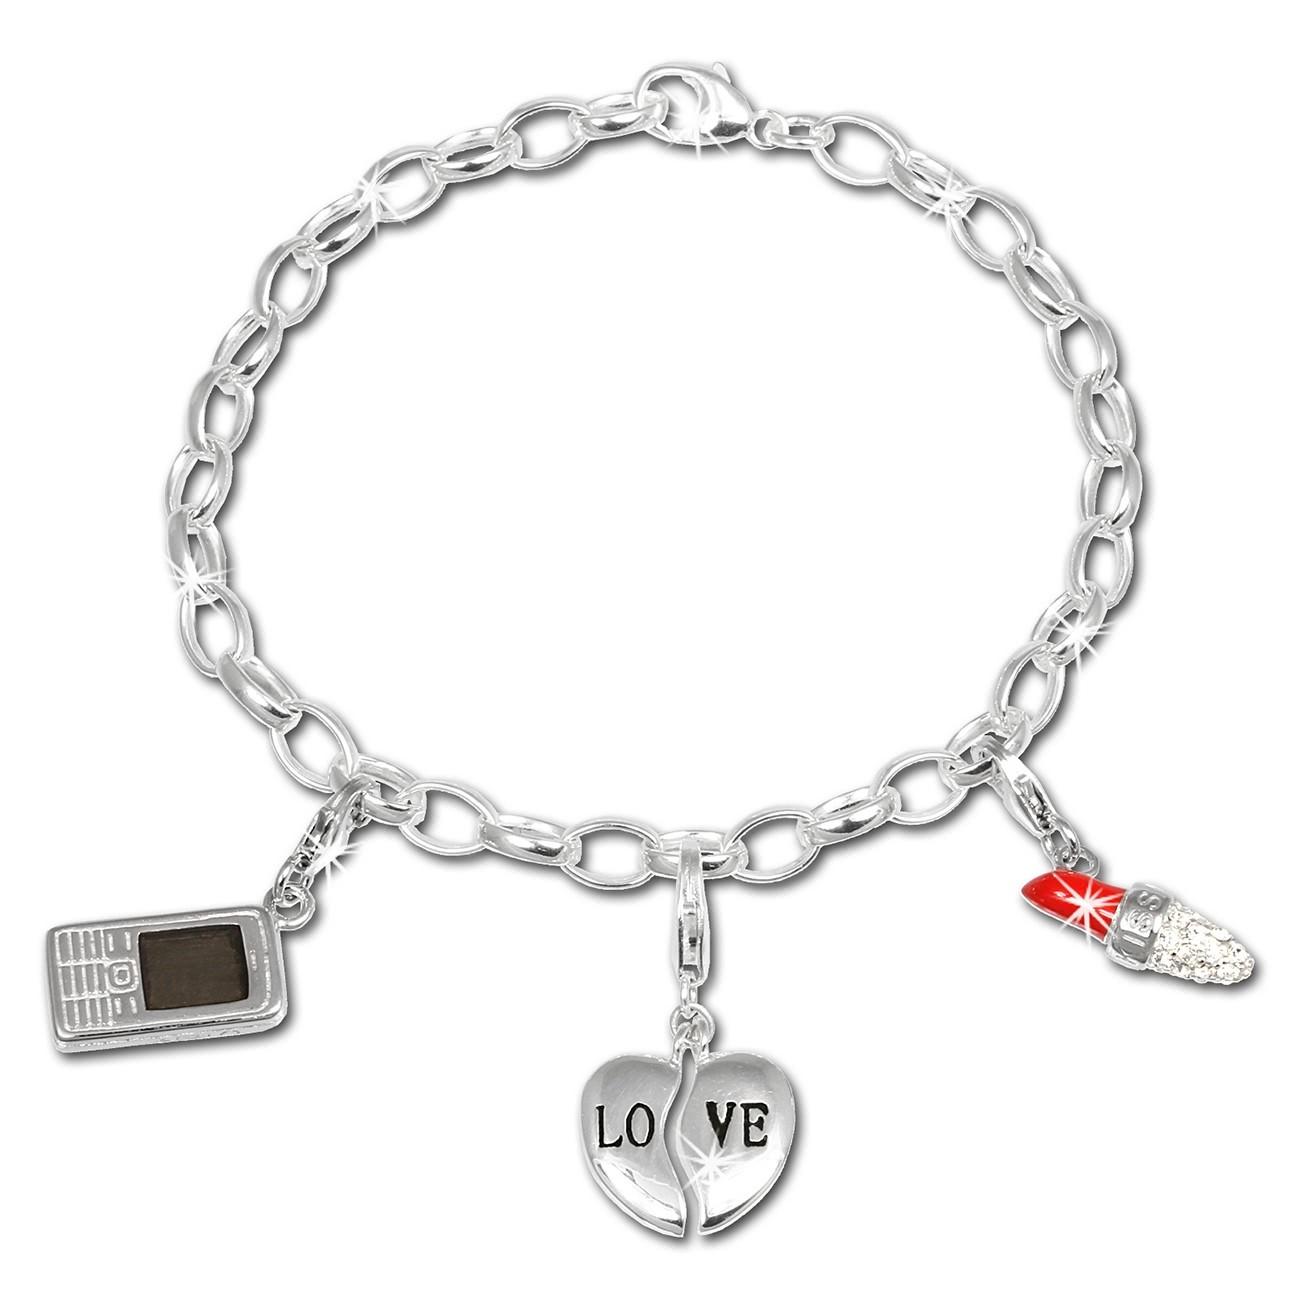 SilberDream Charm Set Love 925er Silber Armband Anhänger FCA308